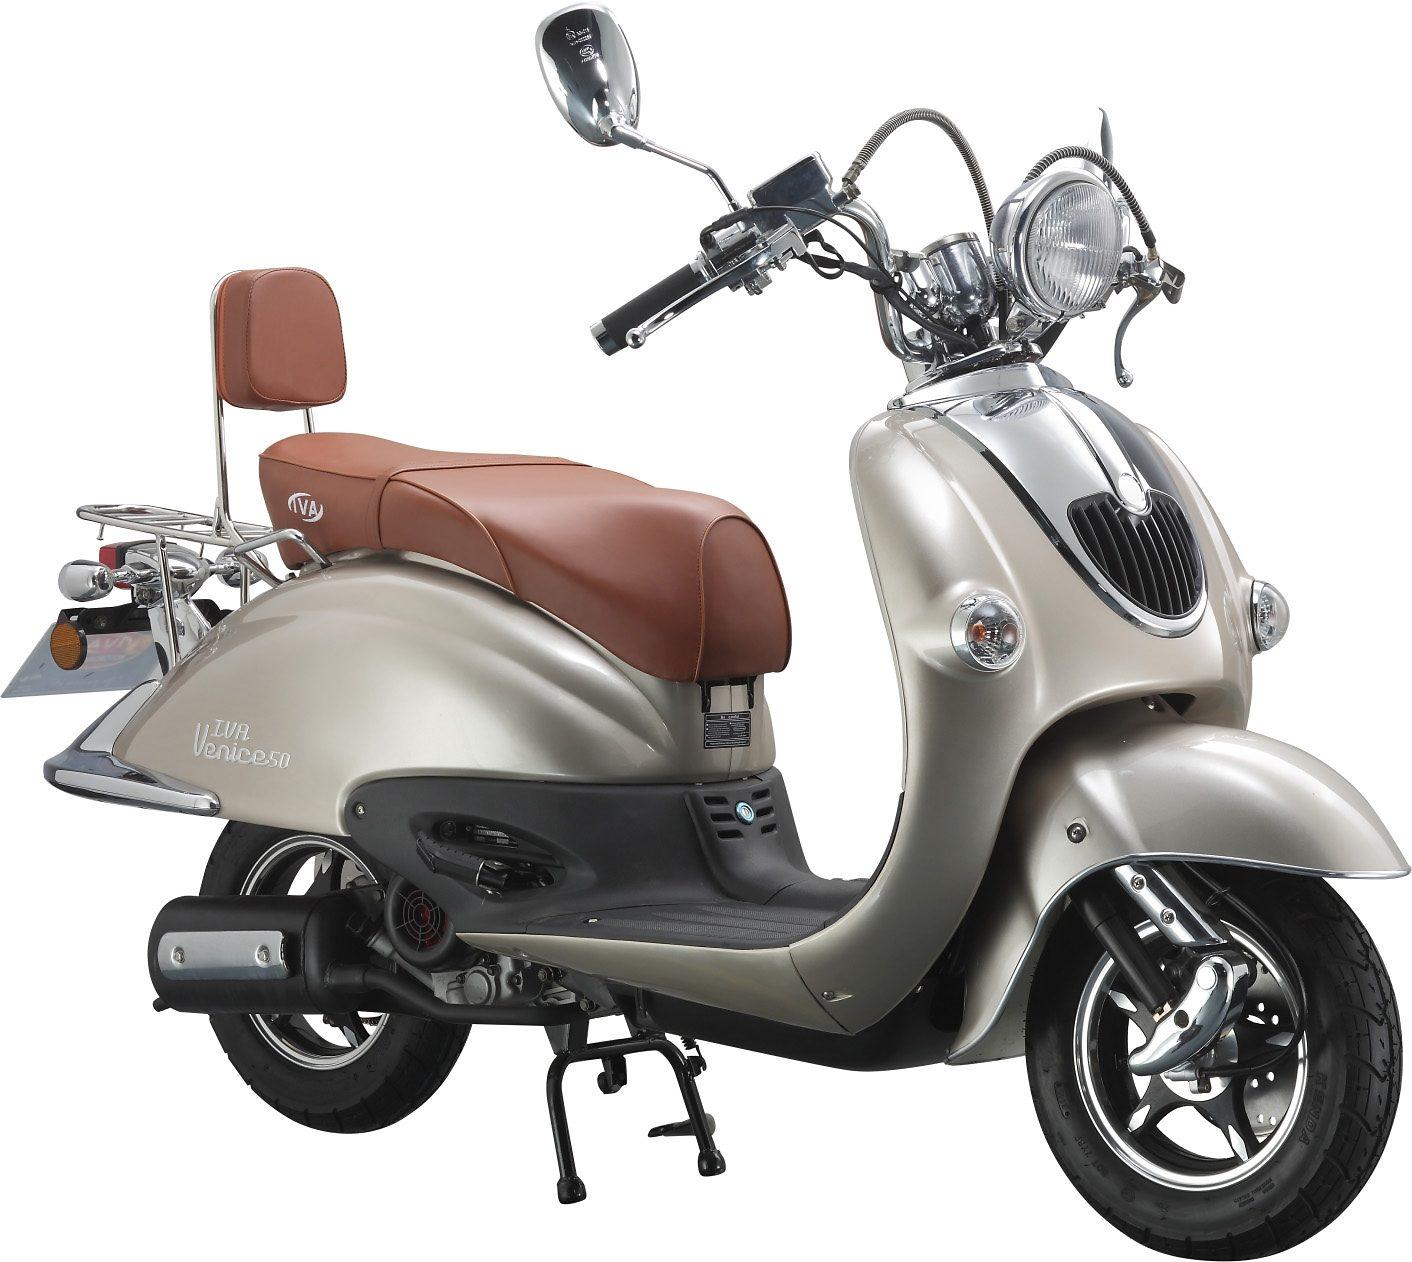 Retro-Motorroller »RETRO VENICE«, 50 ccm 45 km/h, für 2 Personen, champagner/braun